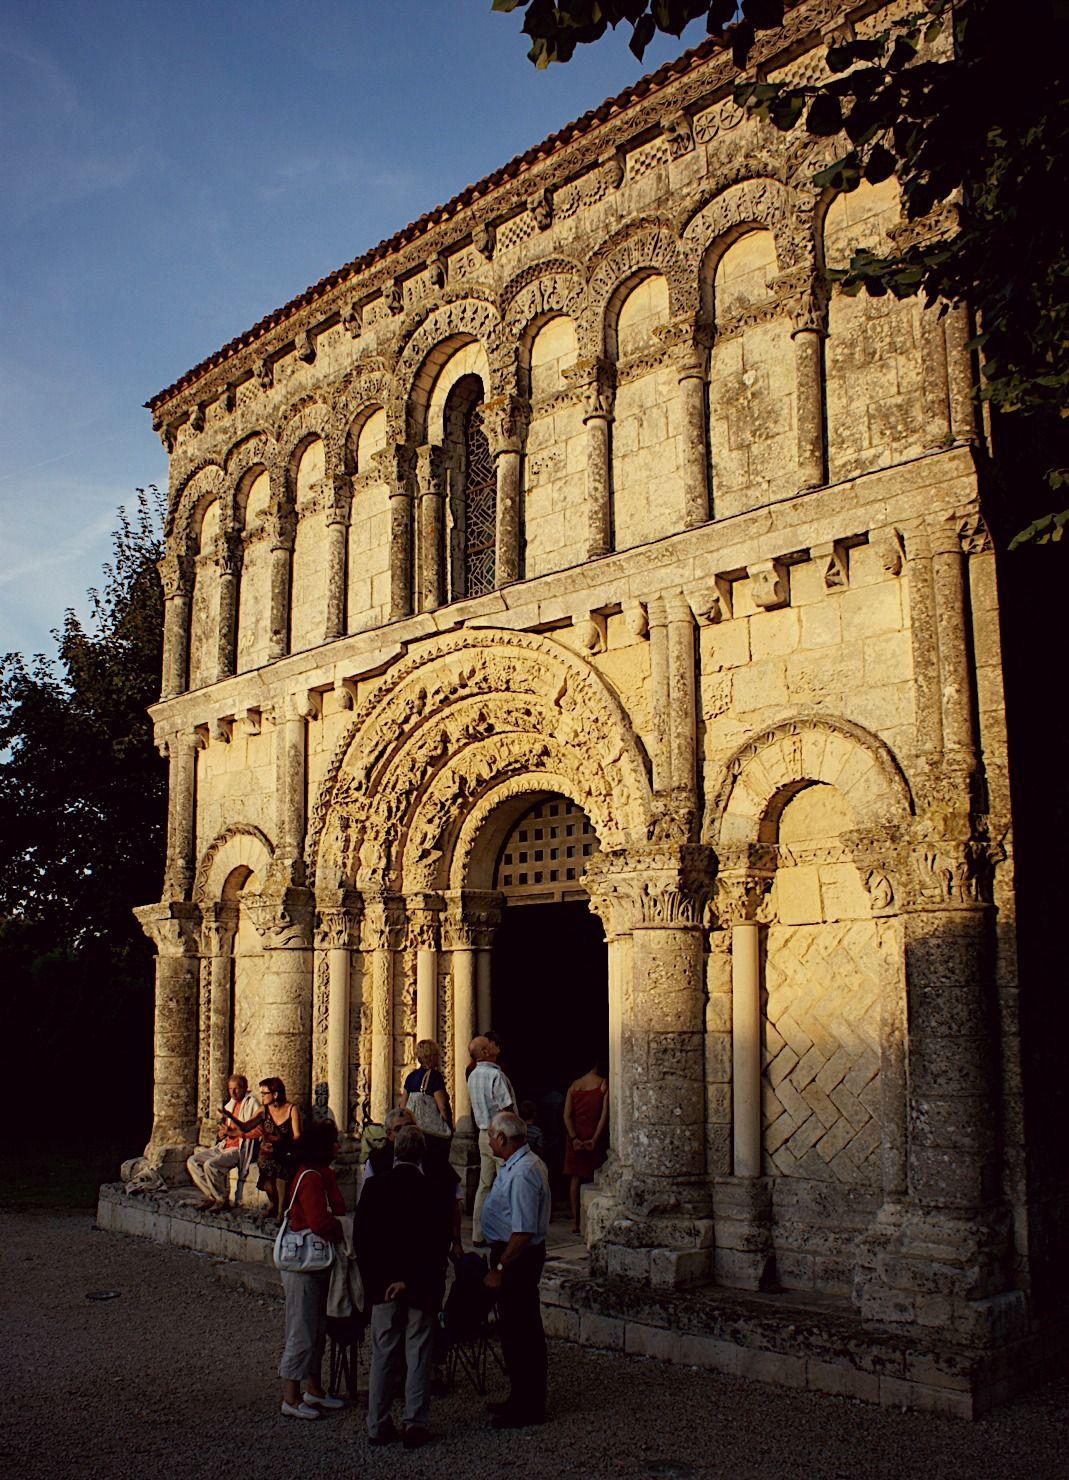 #Eglise romane #Echillais #RochefortOcean Charente Maritime Poitou Charentes